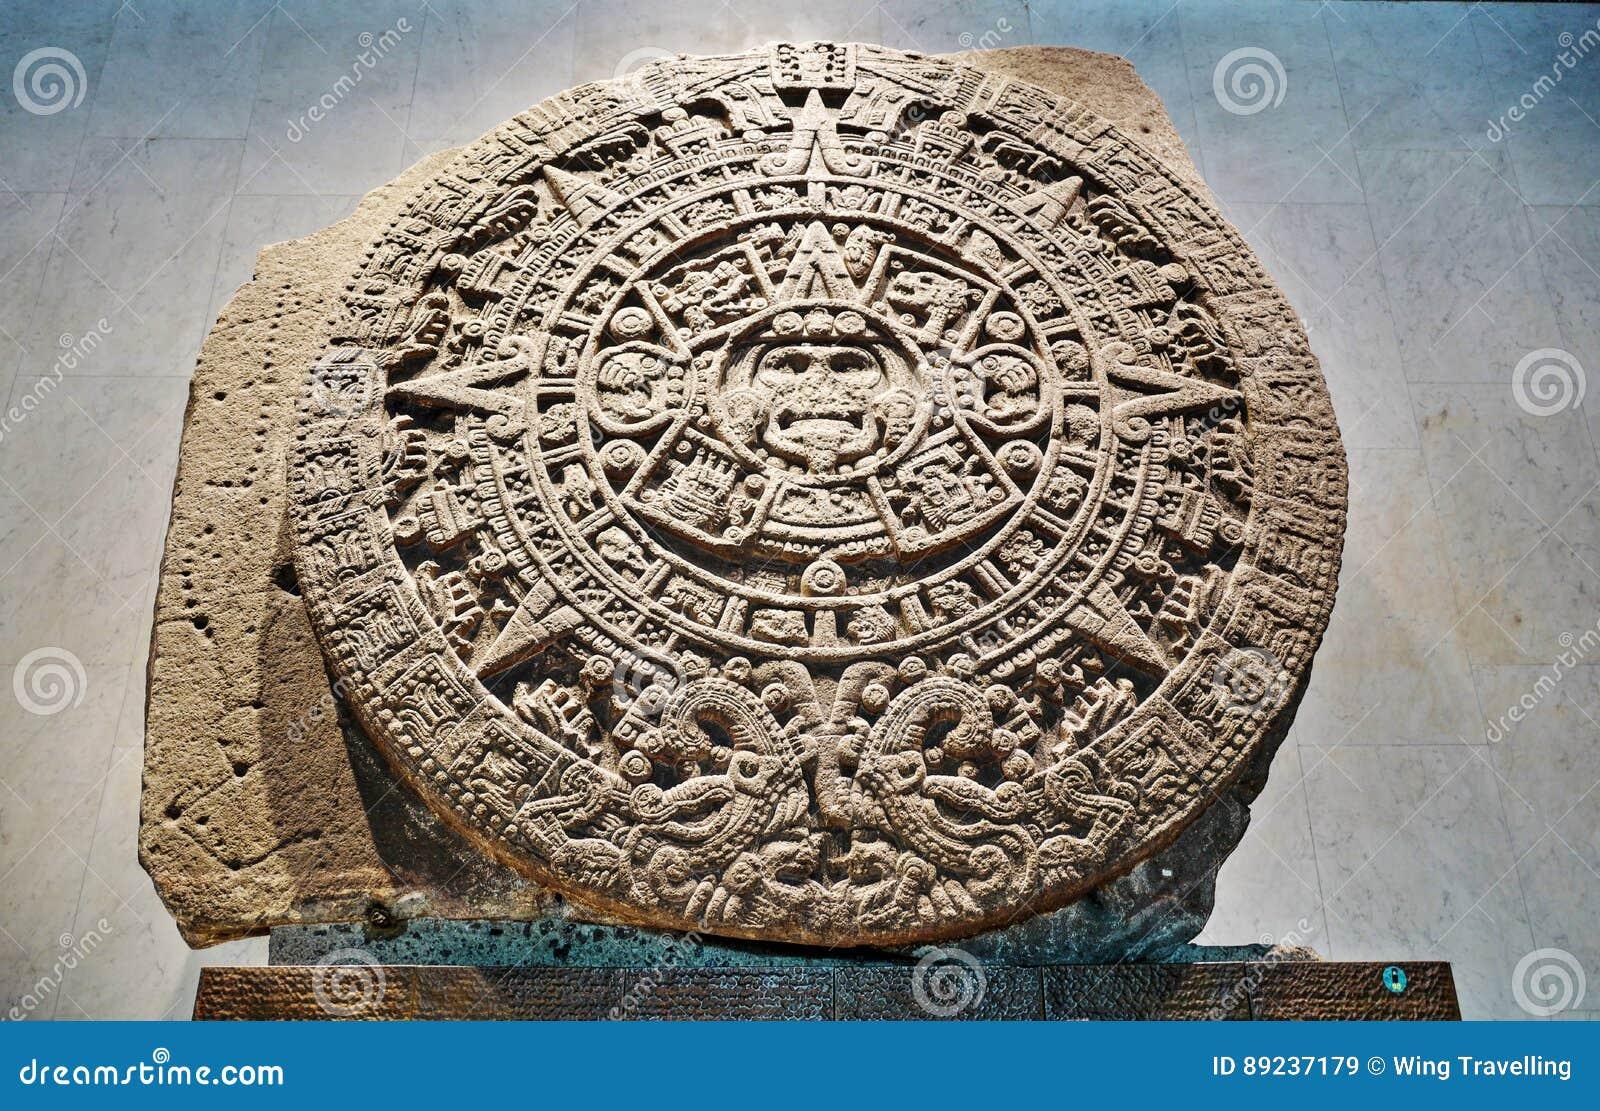 Aztec Calendar Stone.Aztec Calendar Stone Or Sun Stone Stock Image Image Of Mayan